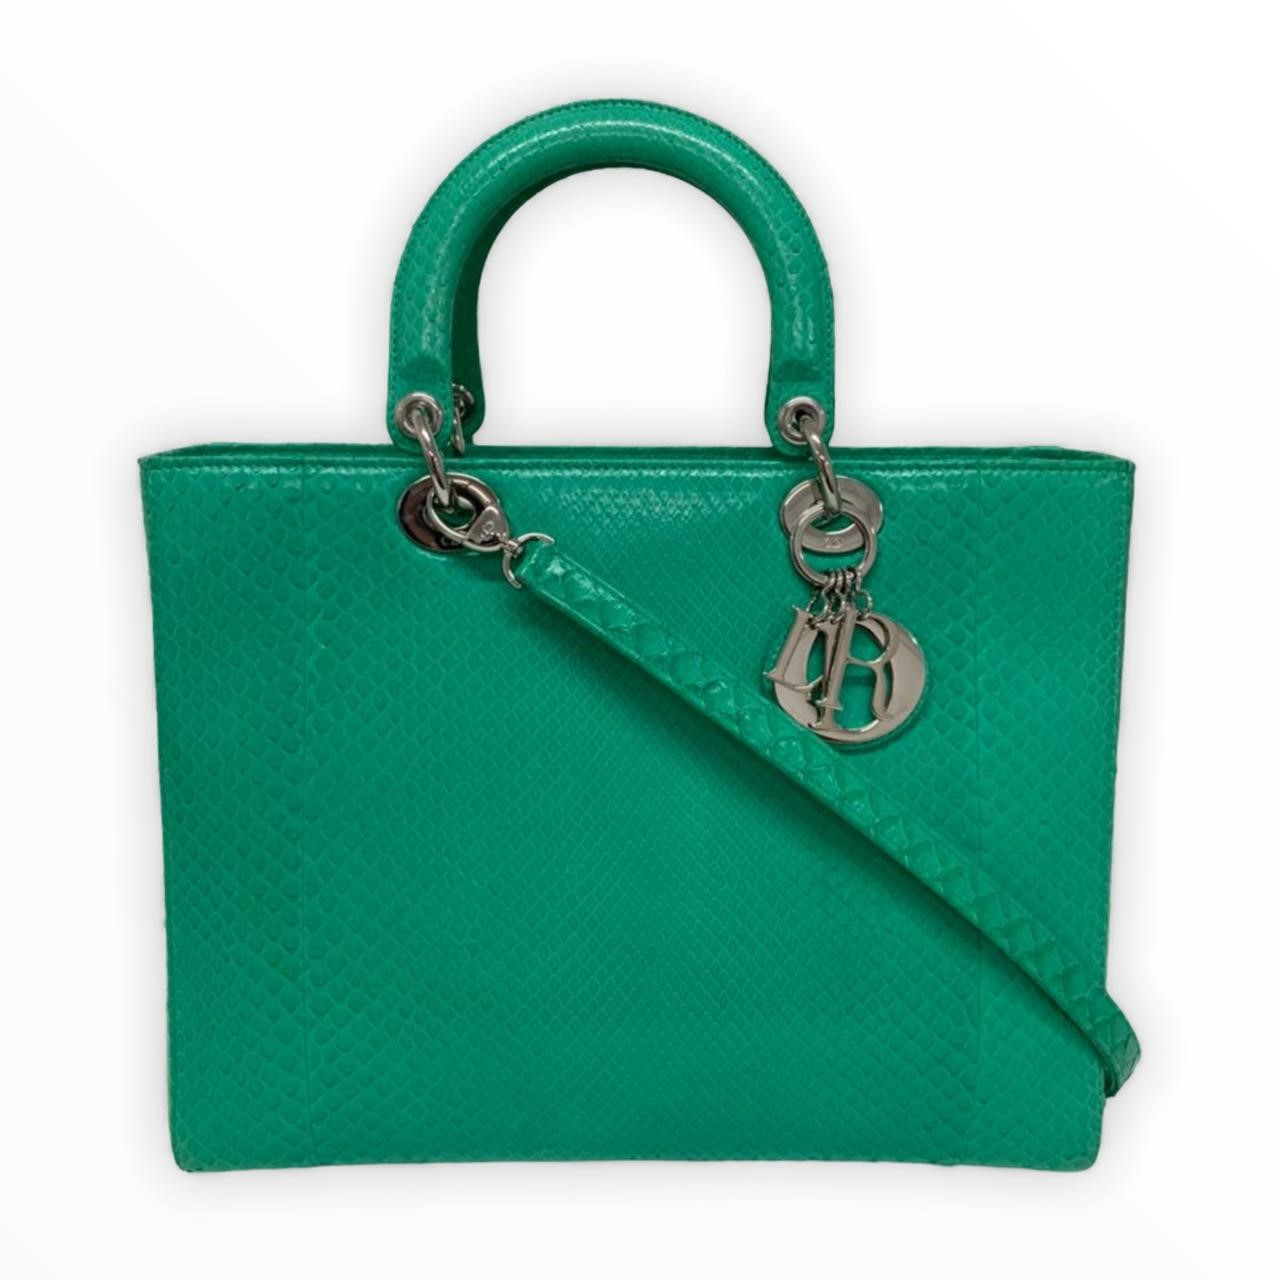 Bolsa Dior 'Lady Dior' Lizard Large